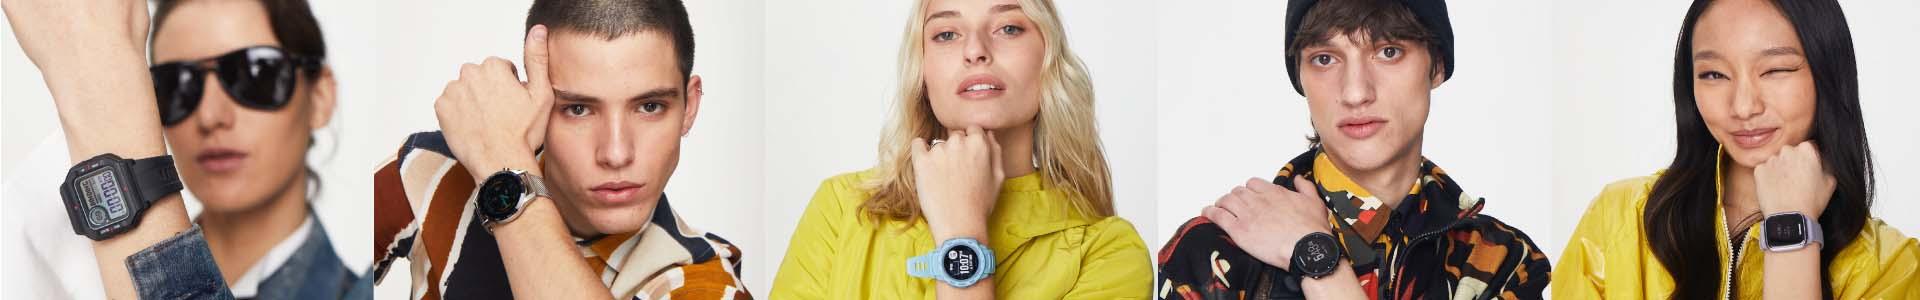 Colección smartwatches